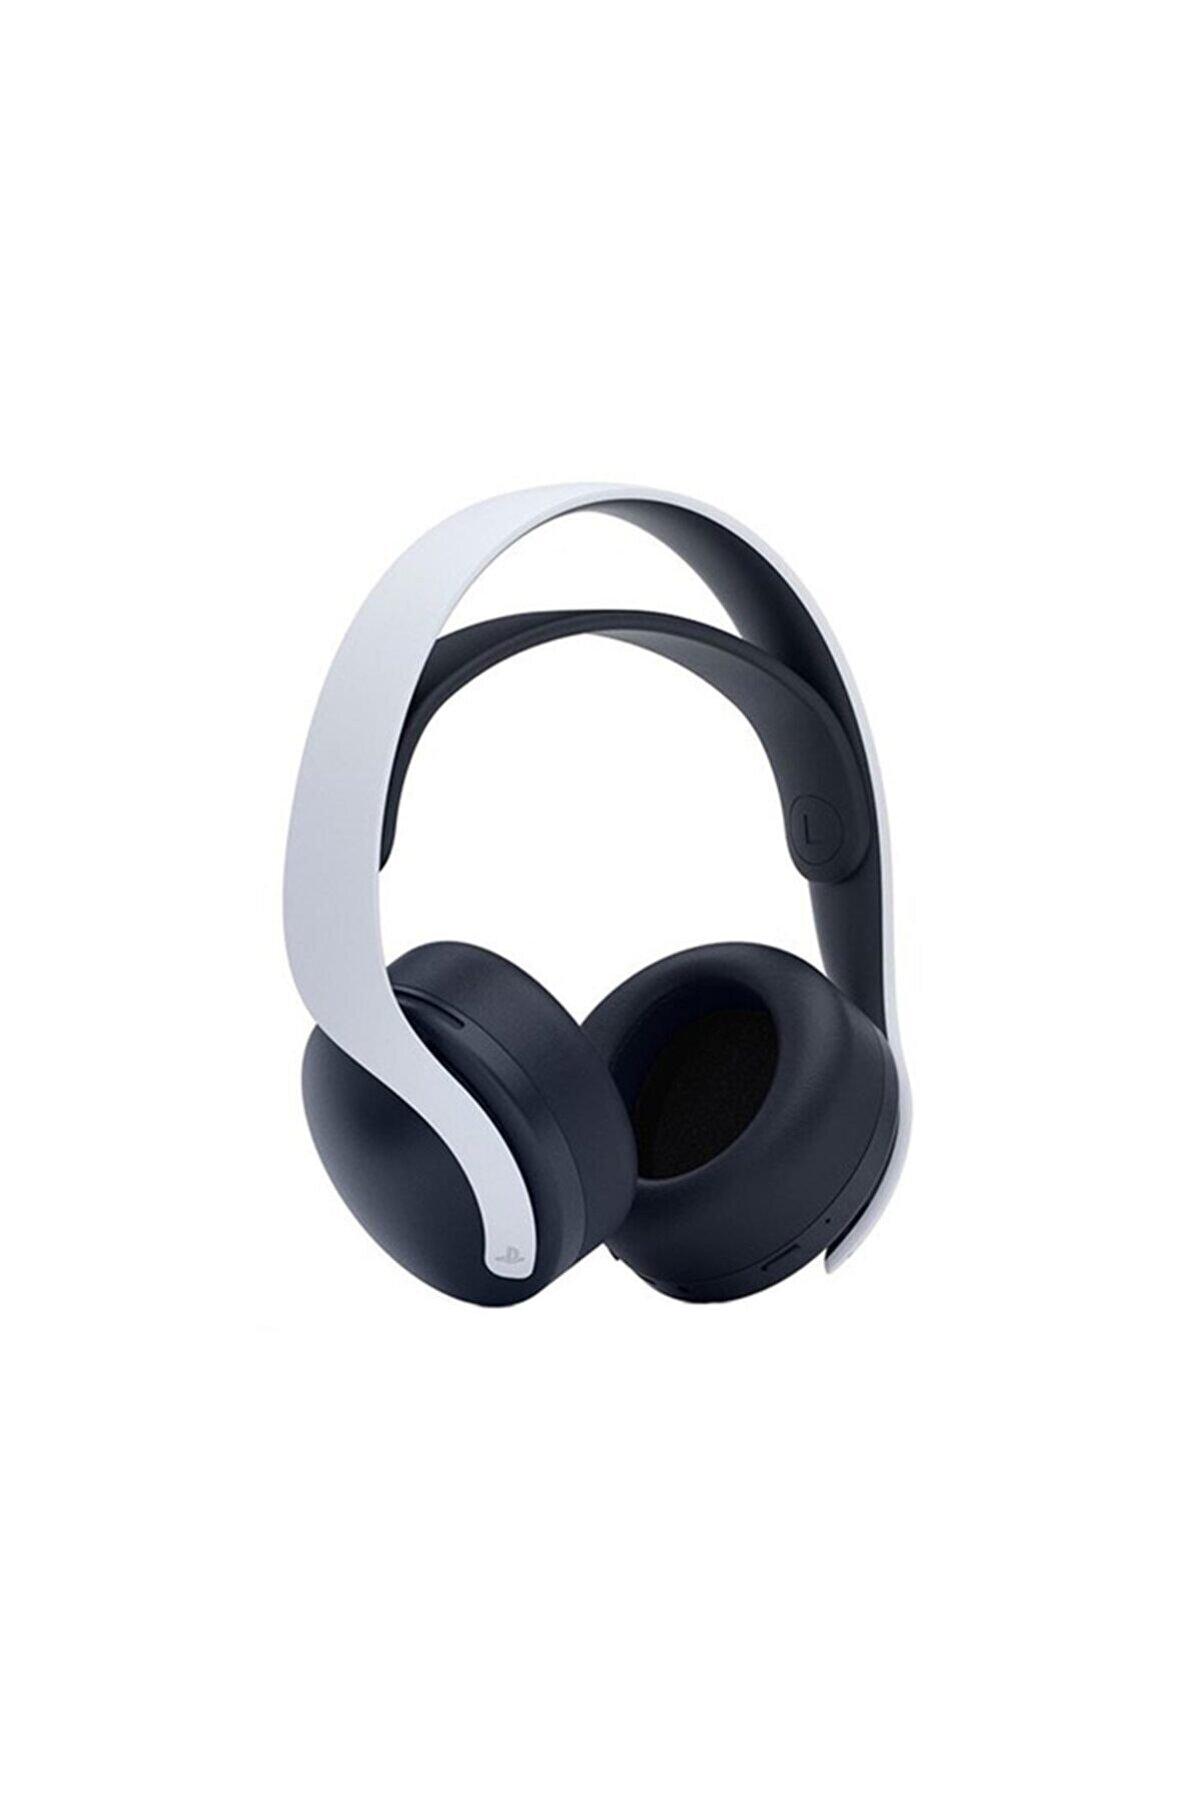 Sony Playstation 5 Pulse 3D Kablosuz Kulaklık - PS5 (Eurasia Garantili)